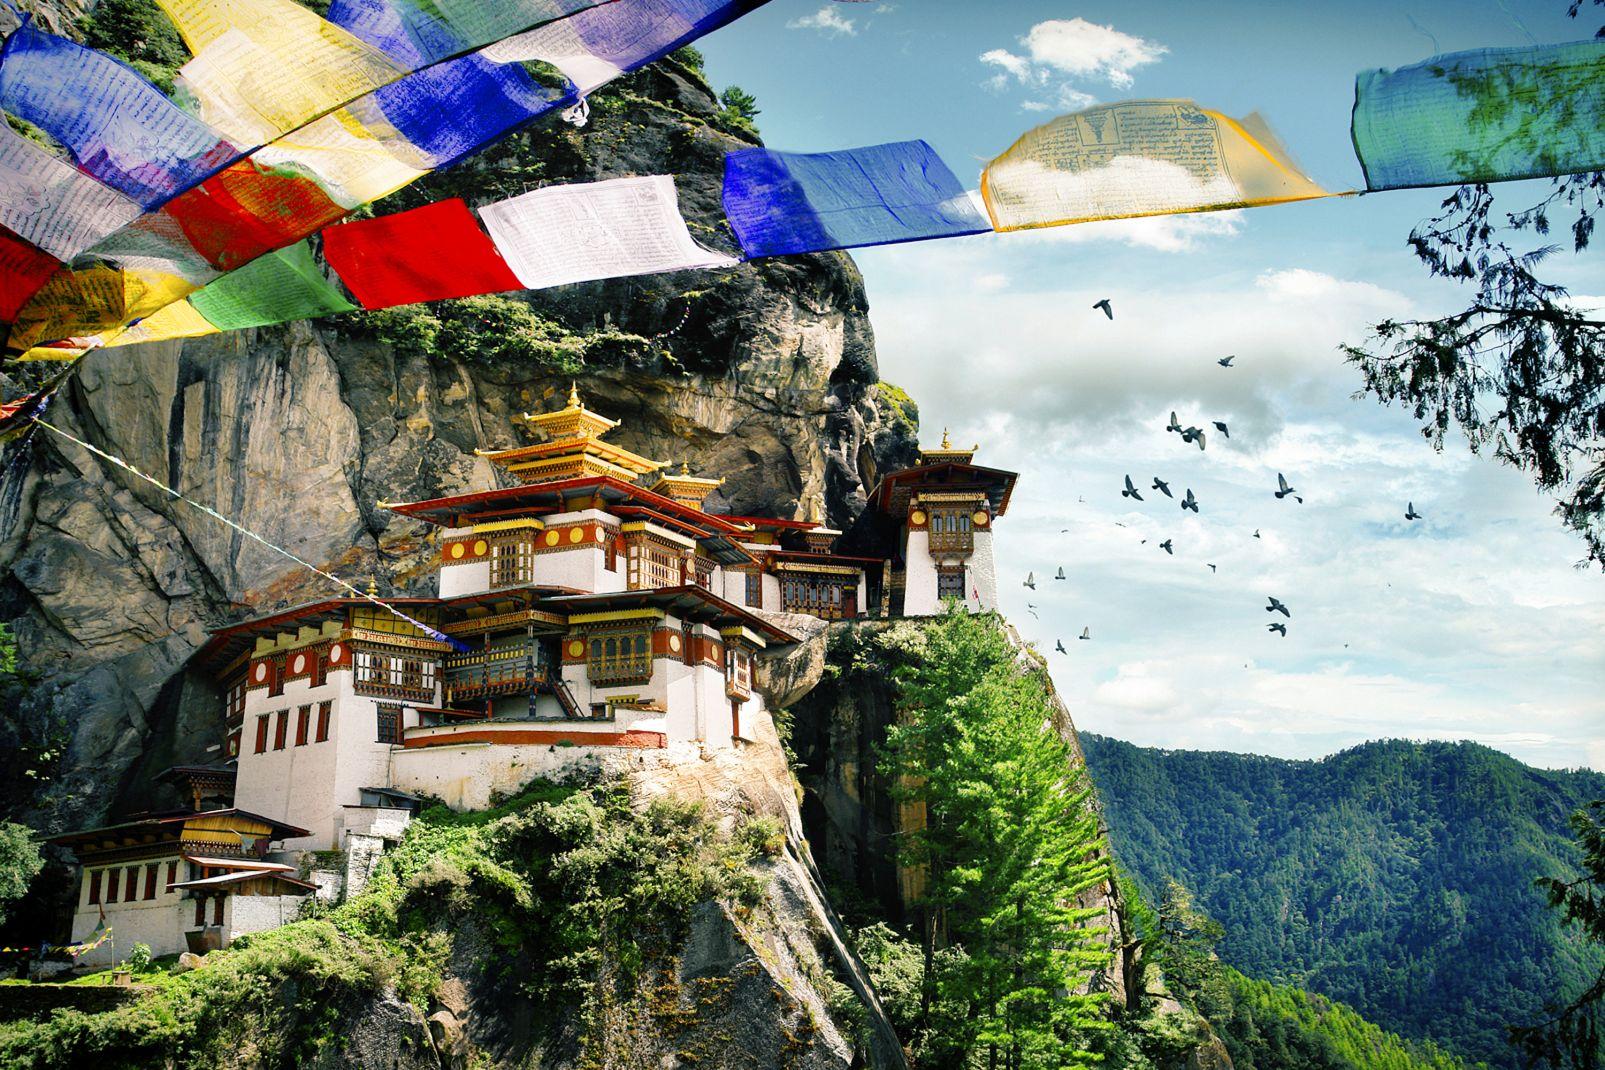 Asie, bhoutan, dzong, monastère, religion, bouddhisme